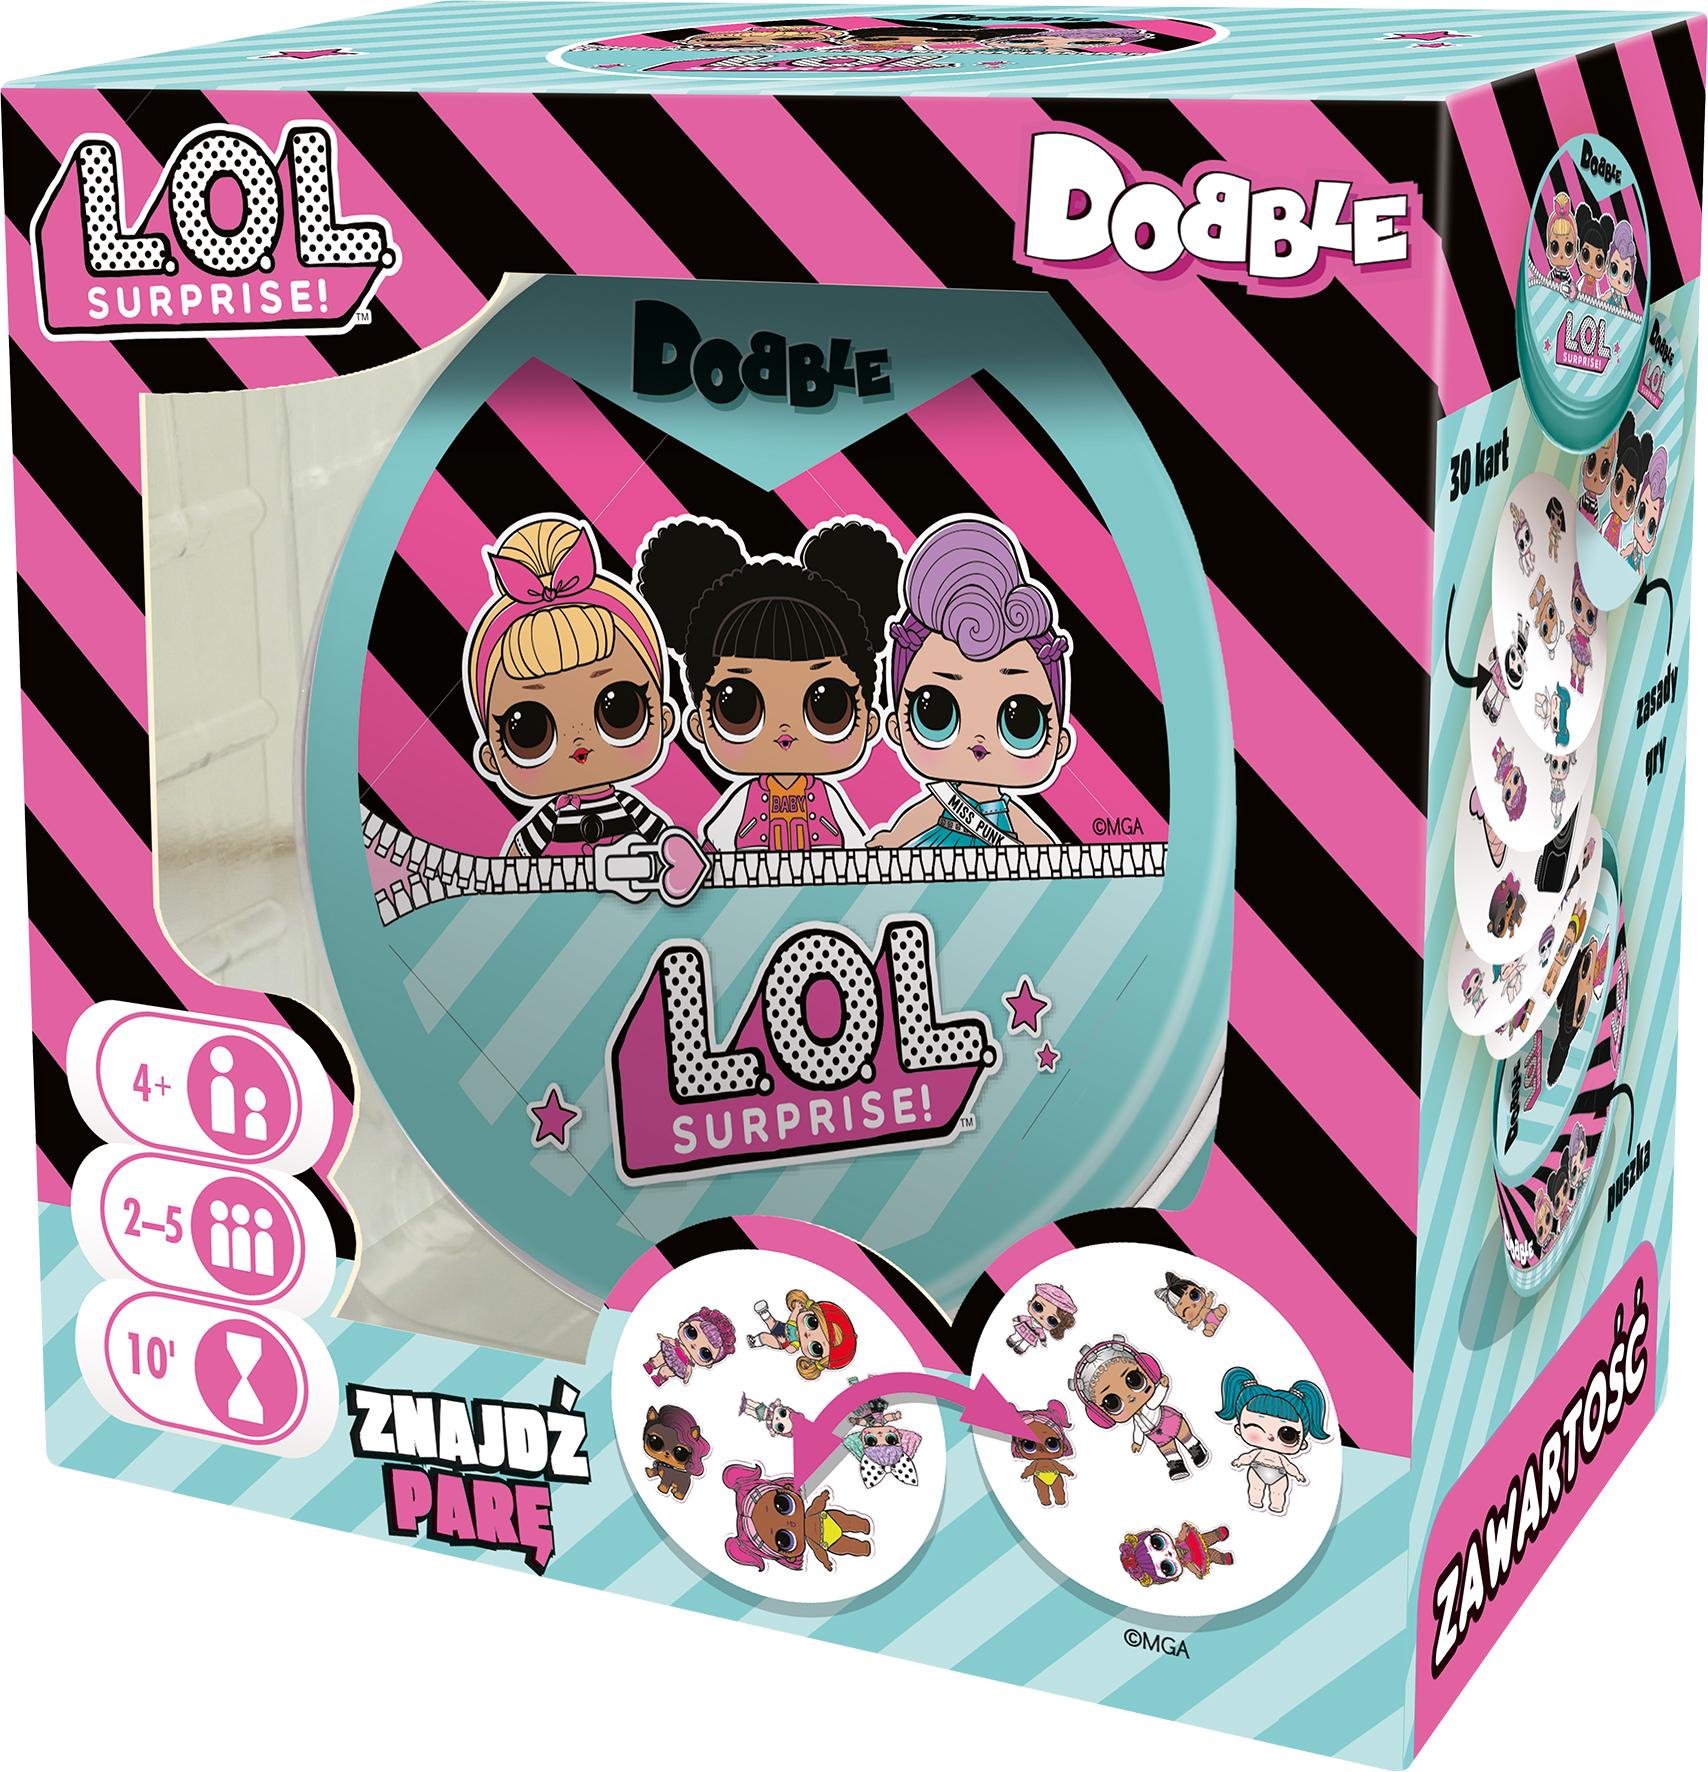 Dobble L.O.L. Surprise (gra karciana)